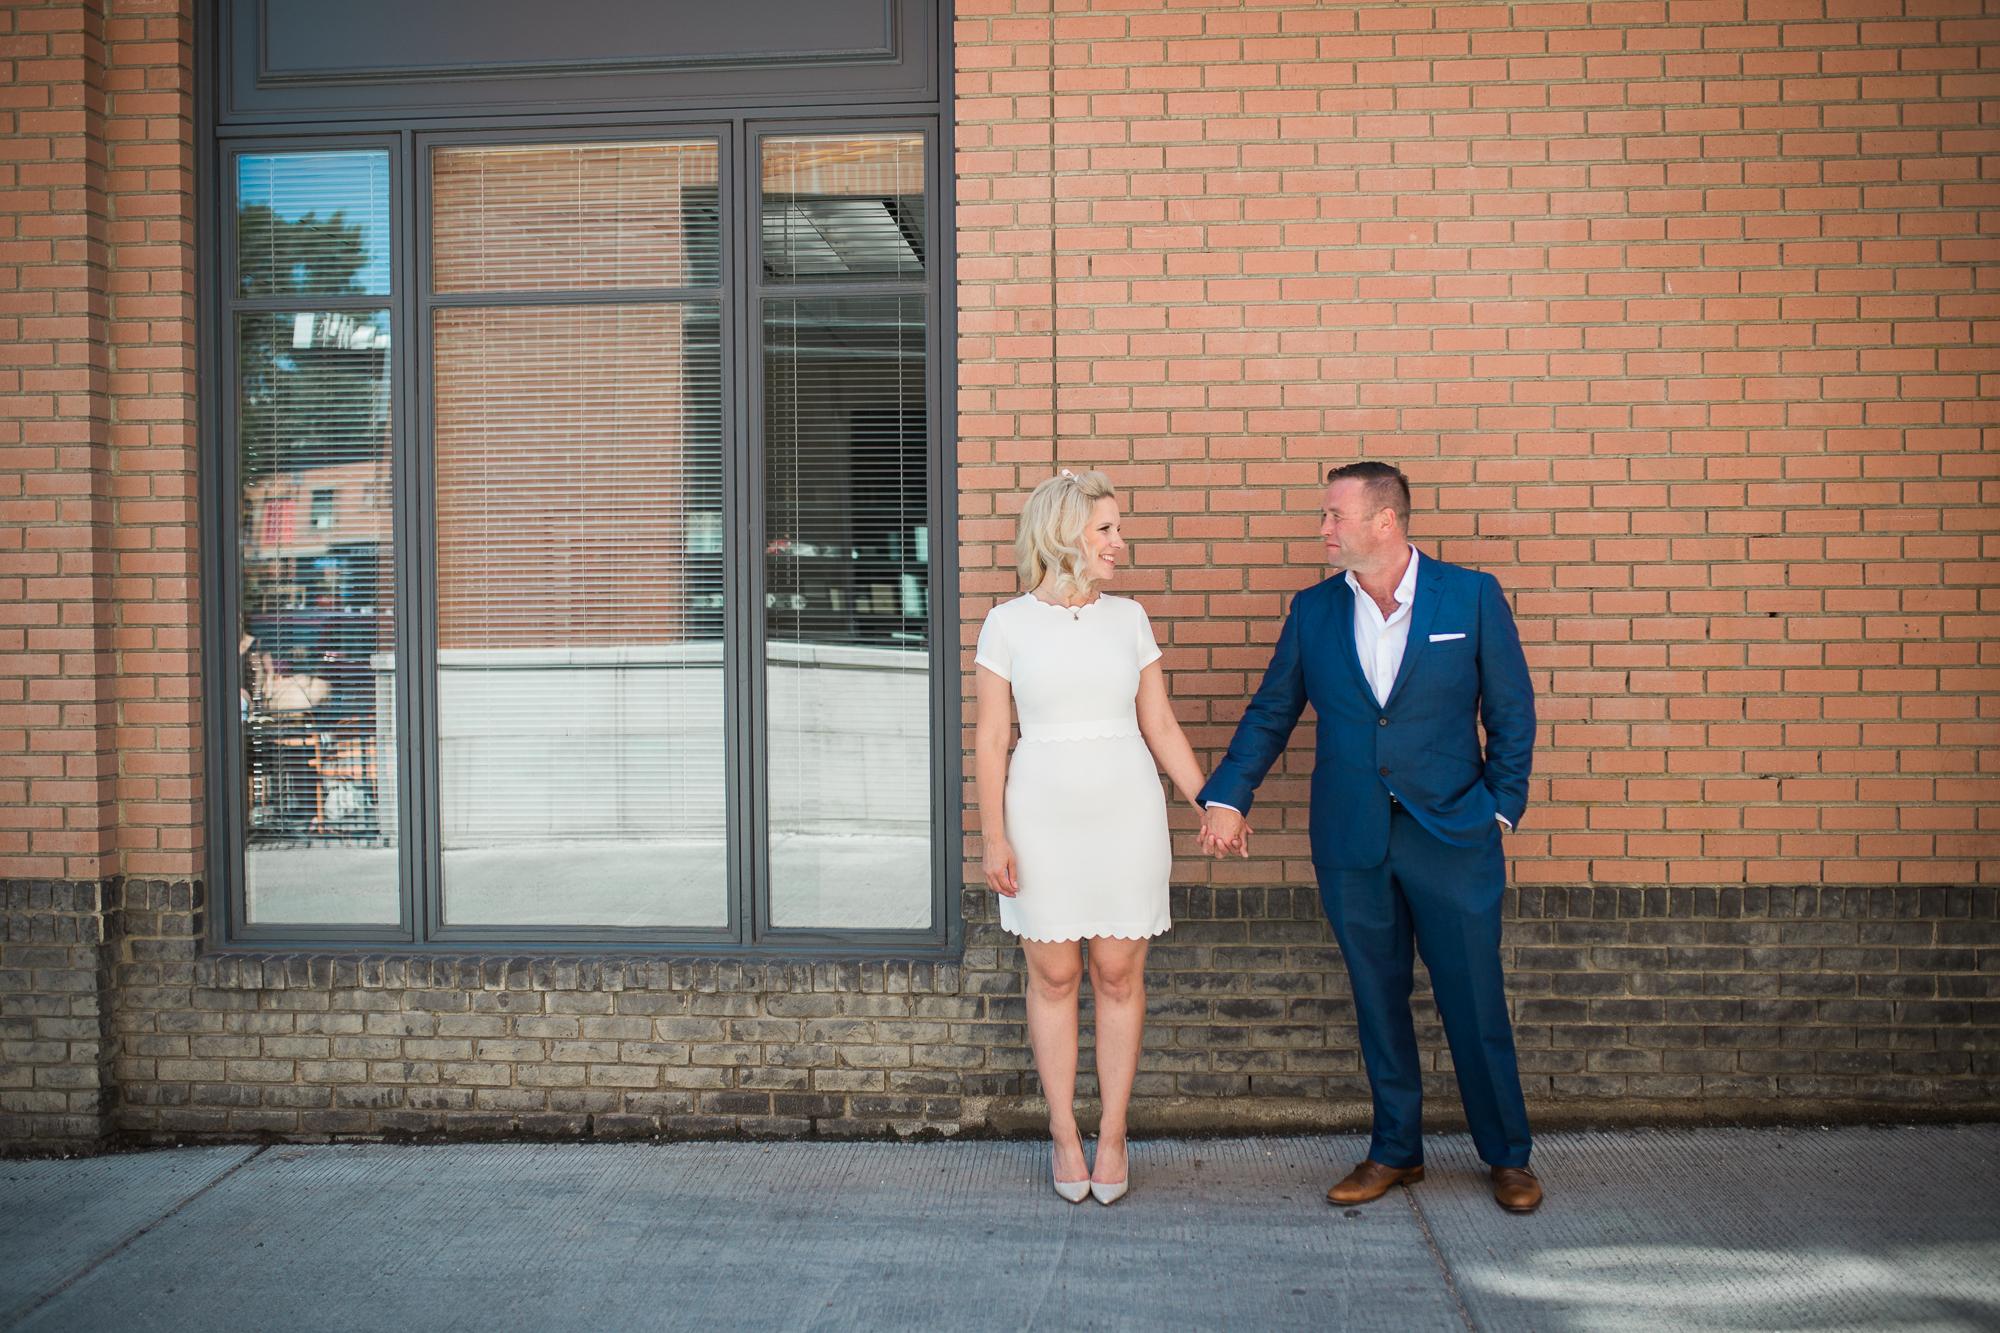 Calgary-wedding-photographer-CG-8.jpg